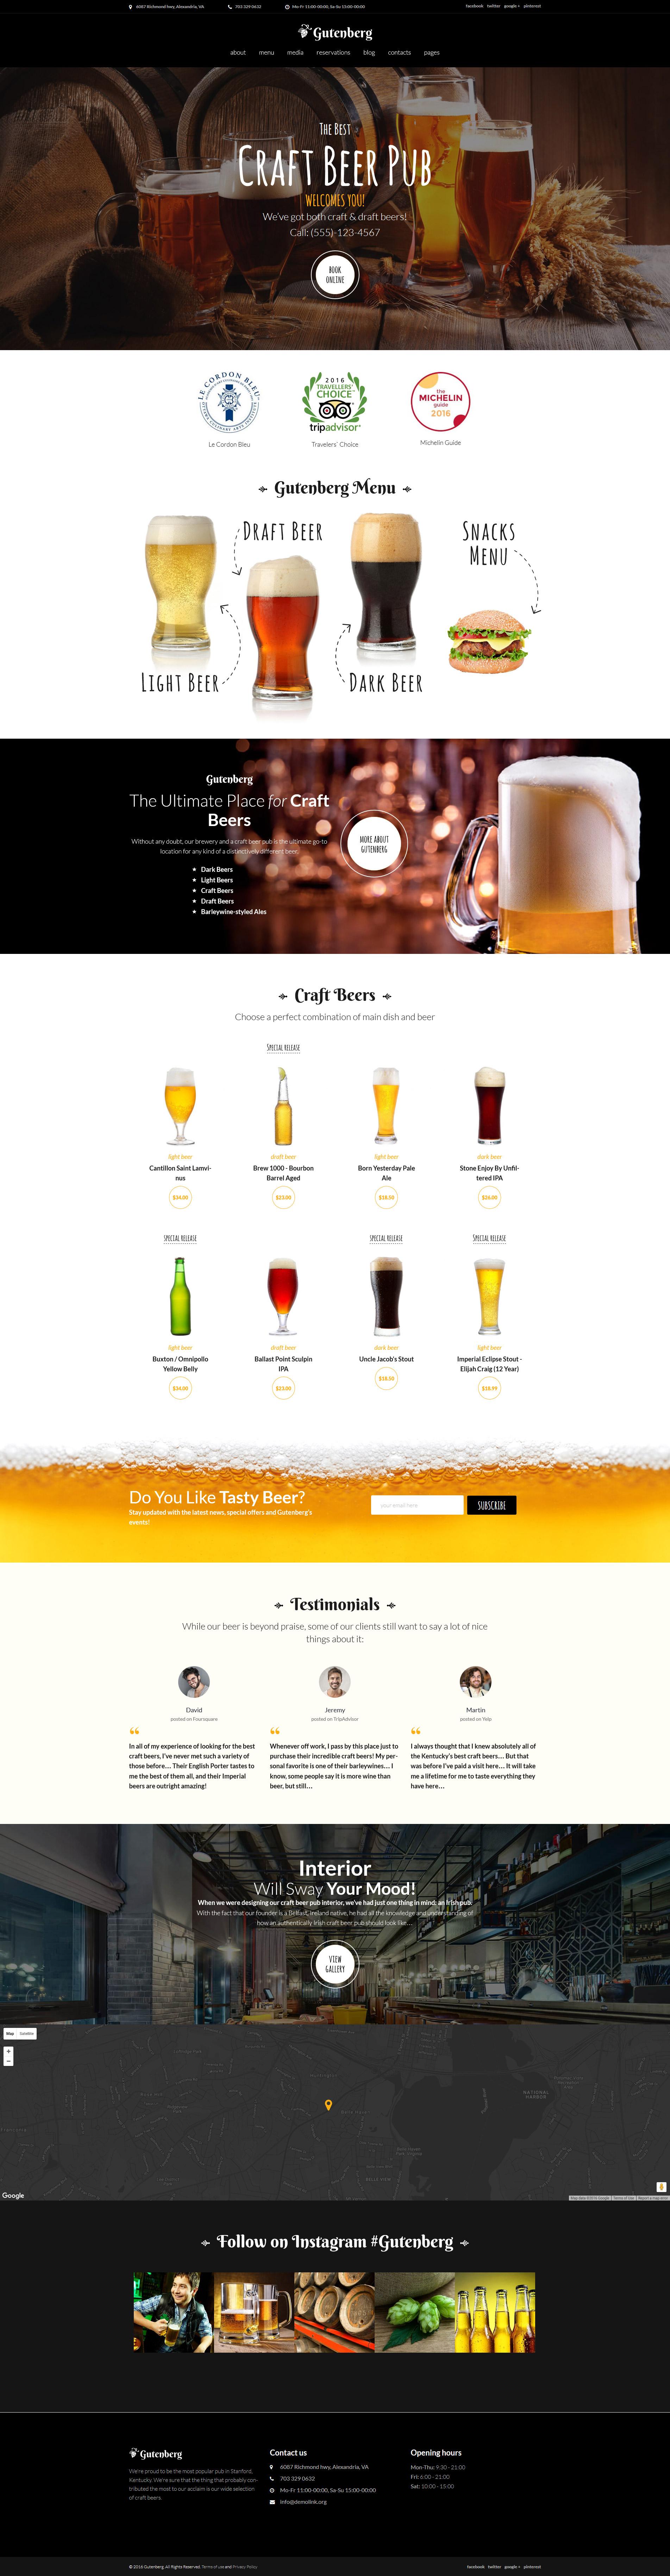 GutenBerg - Beer Pub and Brewery Tema WordPress №59005